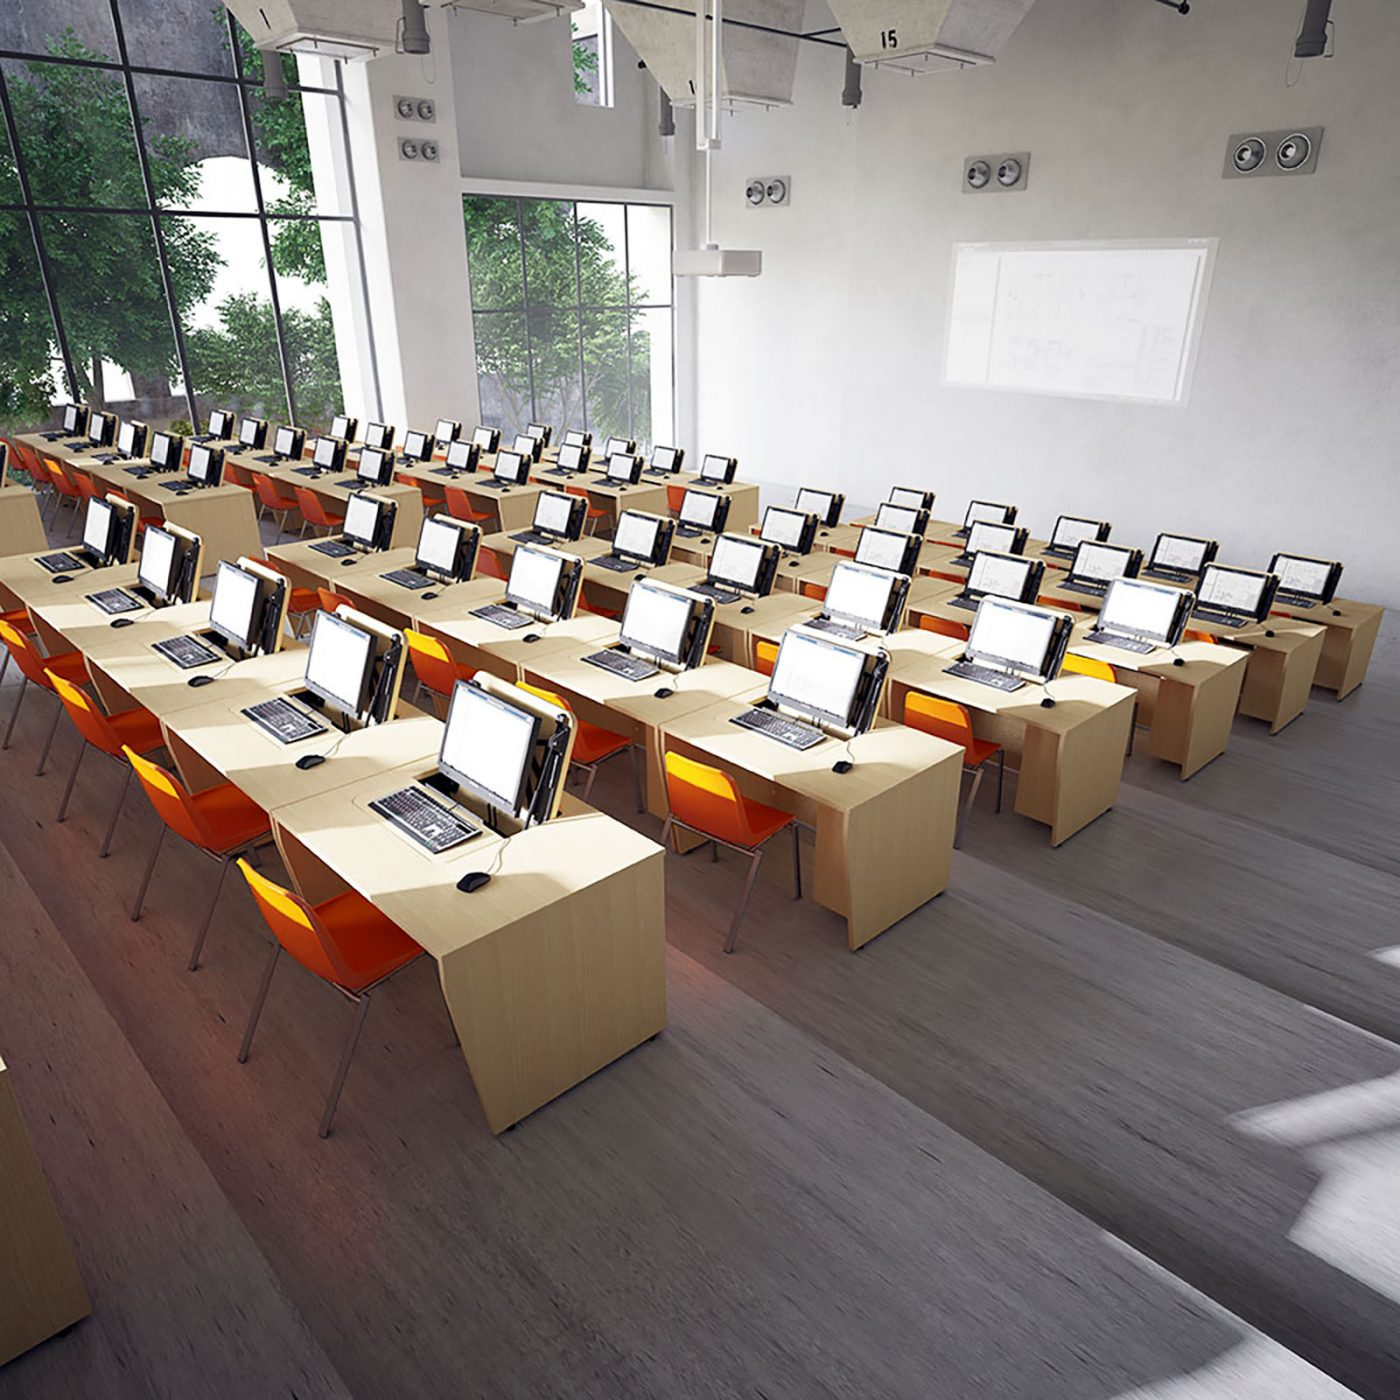 modular desks, IT desks, school furniture, school desks, classroom desks, classroom furniture